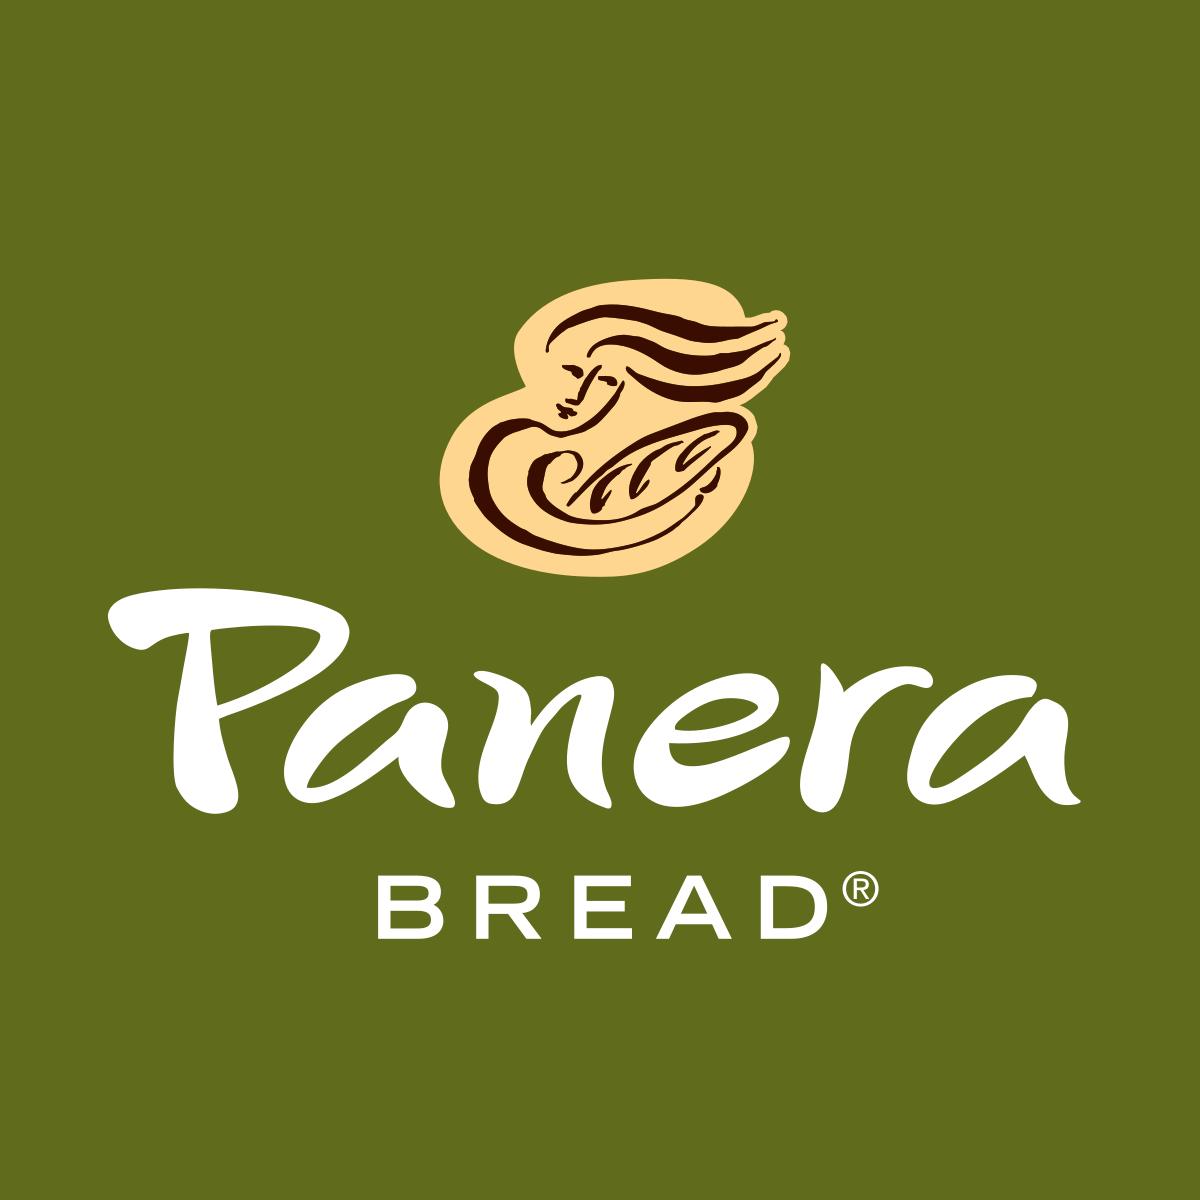 Panera Bread - Southern Palm Crossing